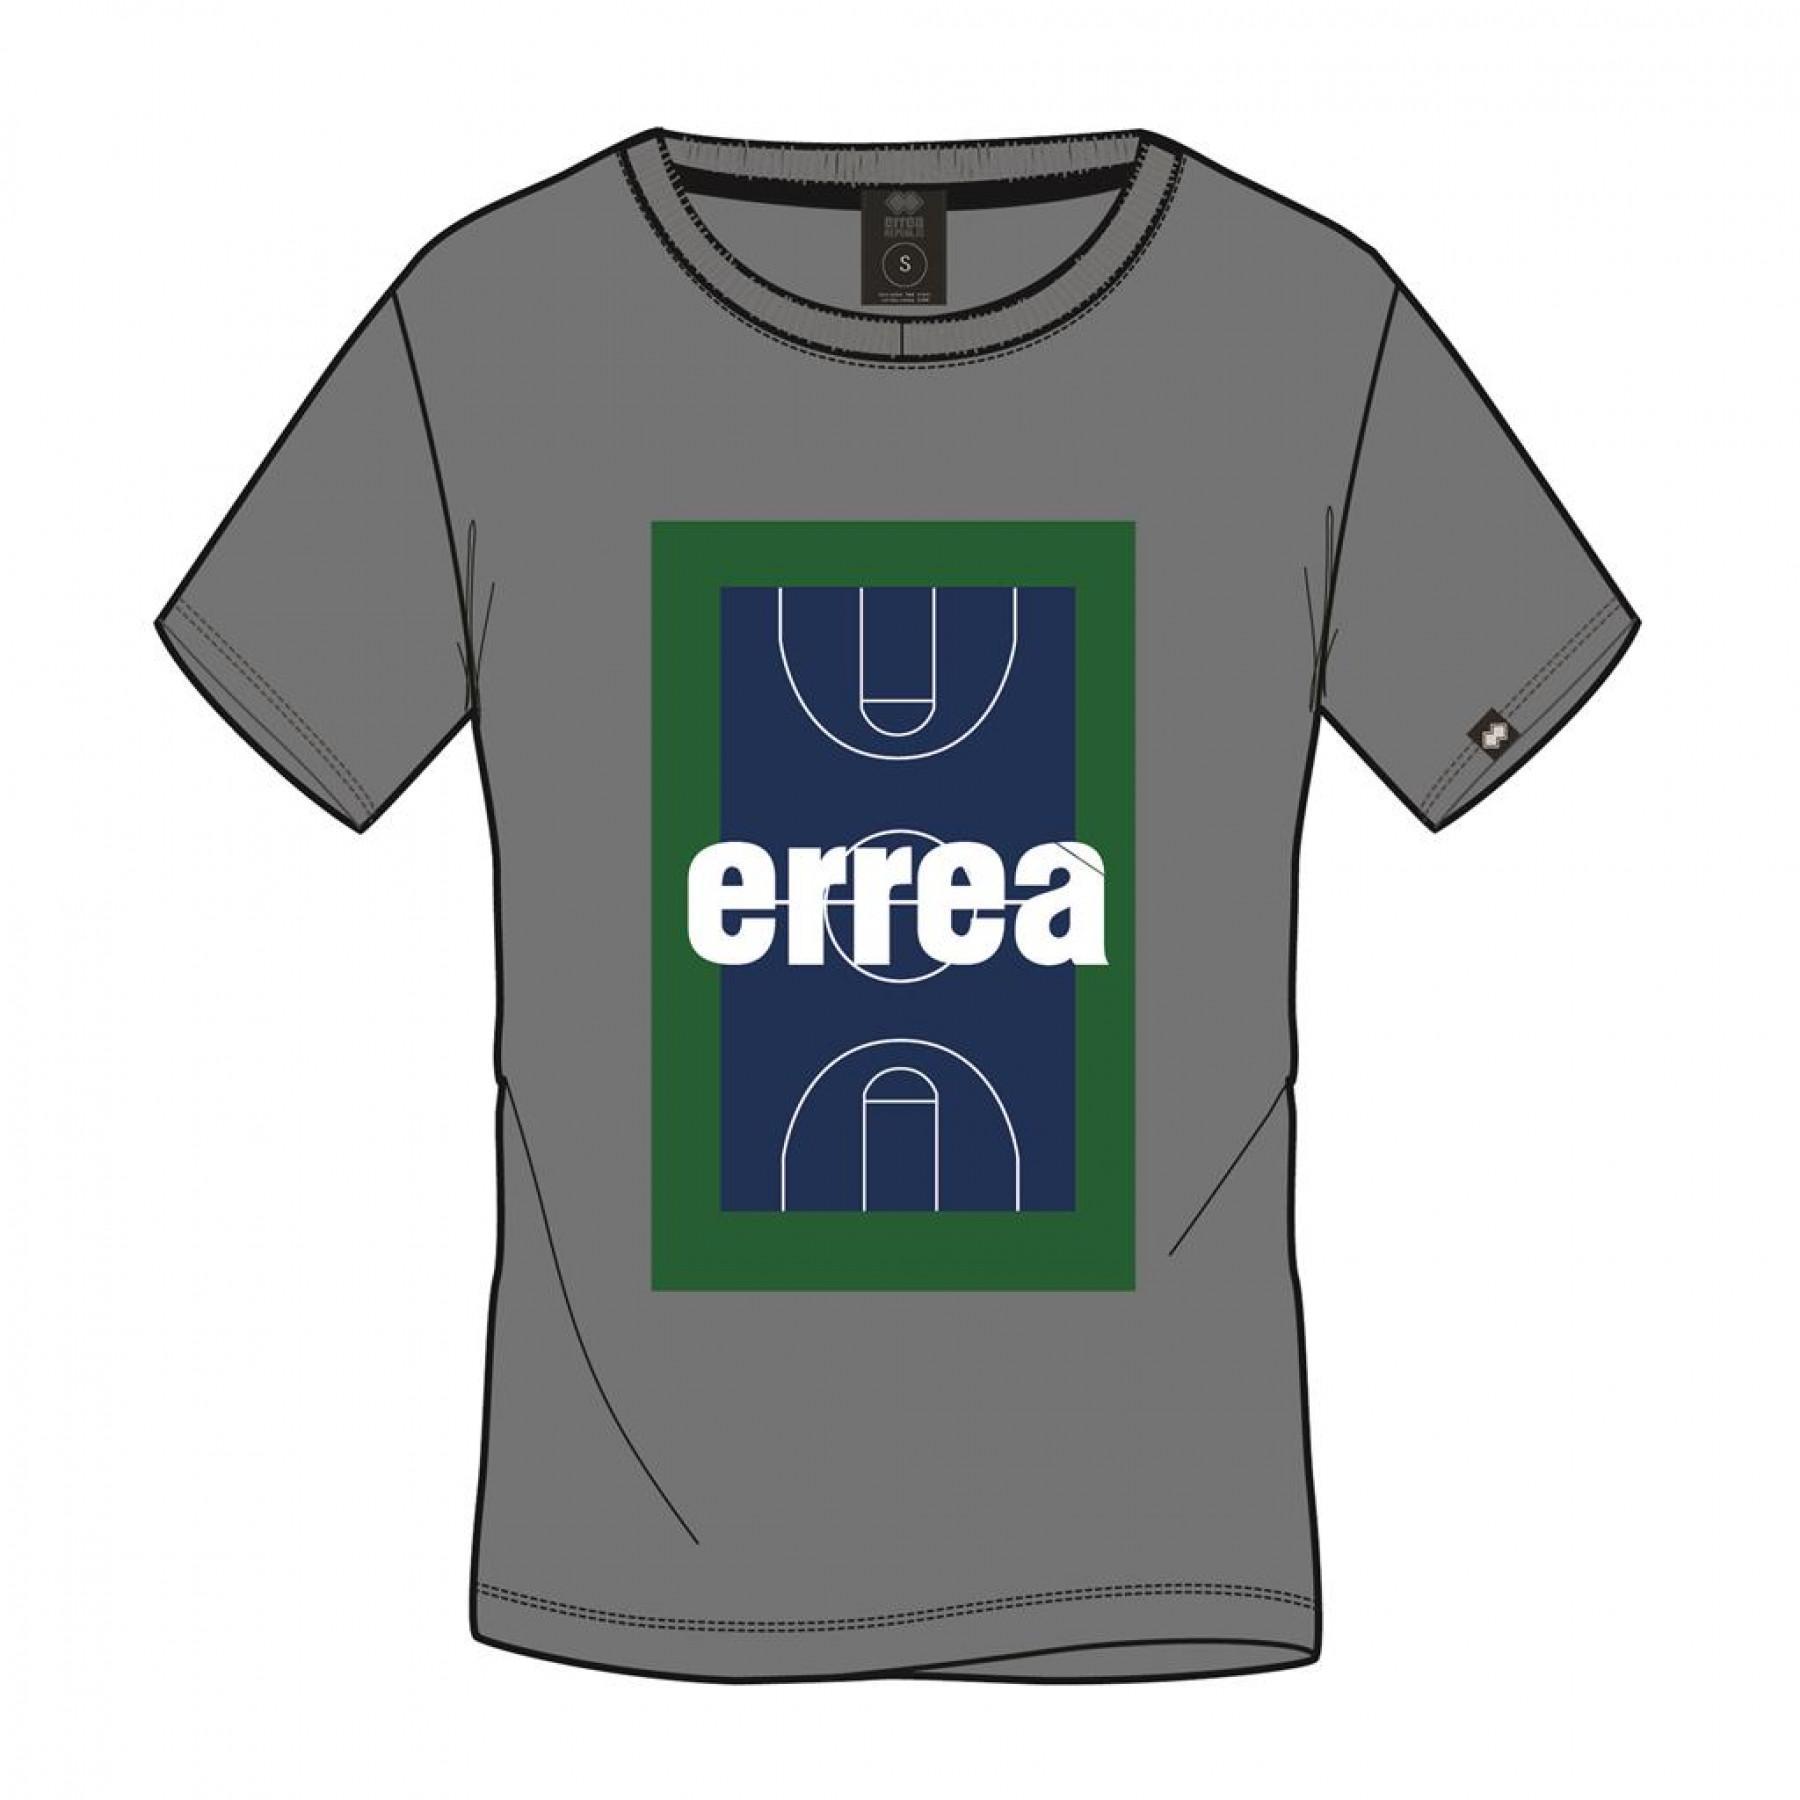 T-shirt Errea Sport merging print ad